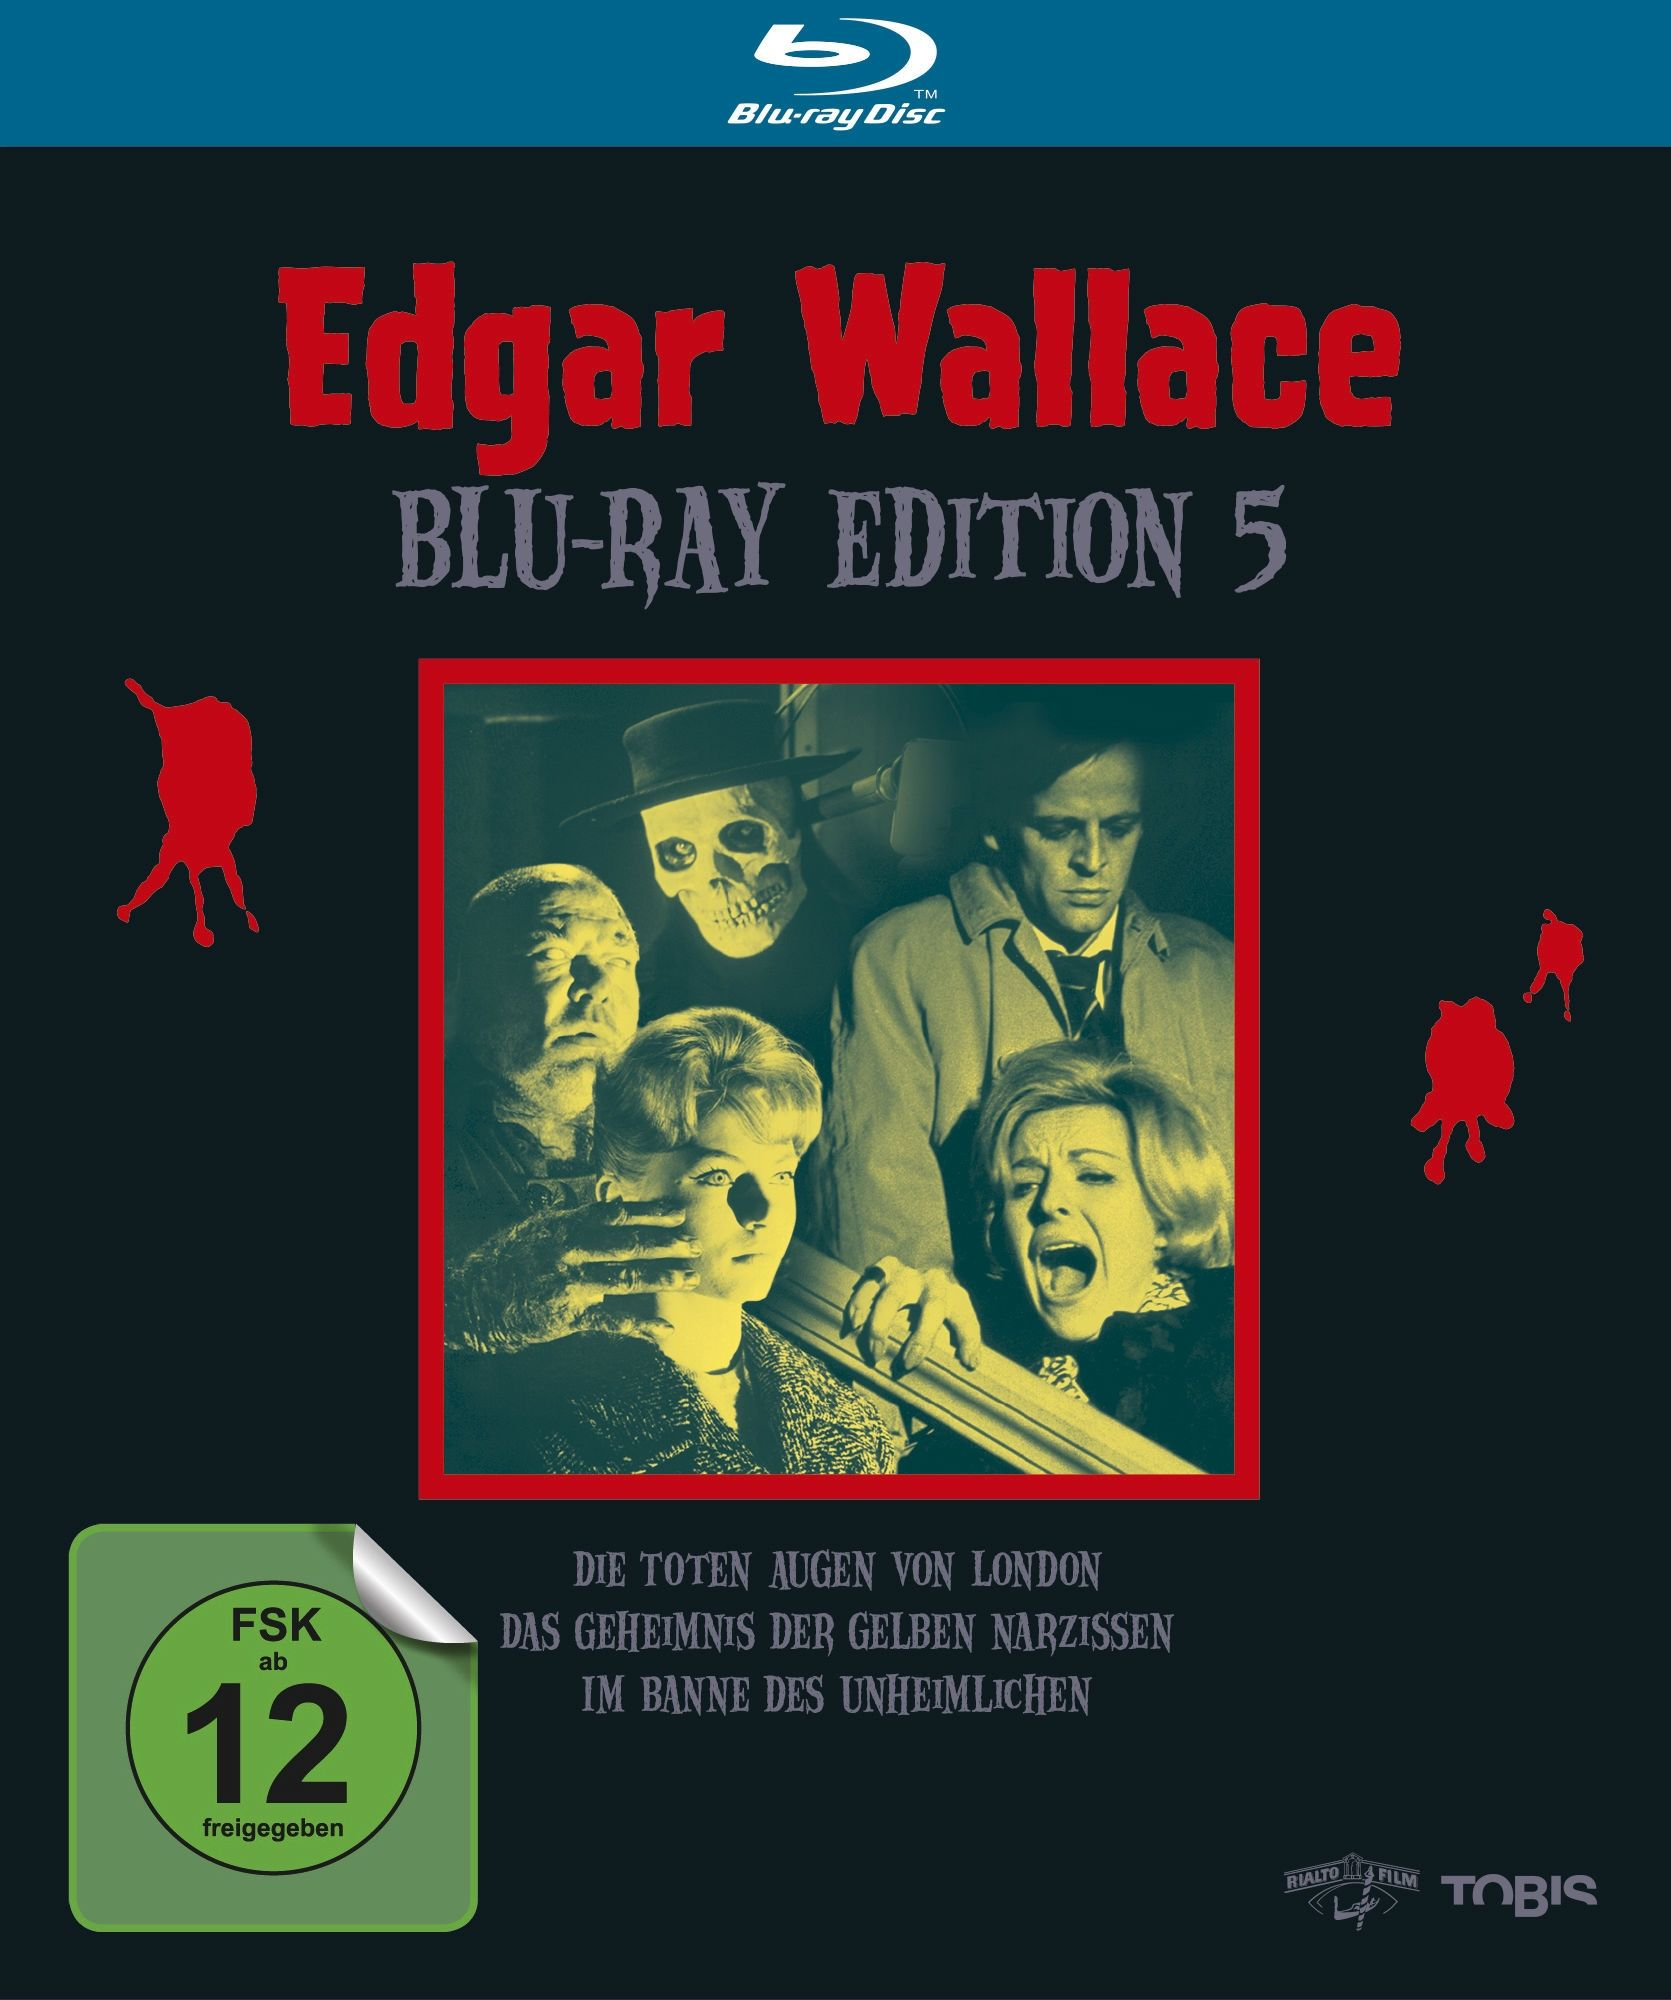 Edgar Wallace - Edition 5 (3 Discs) (BLURAY)